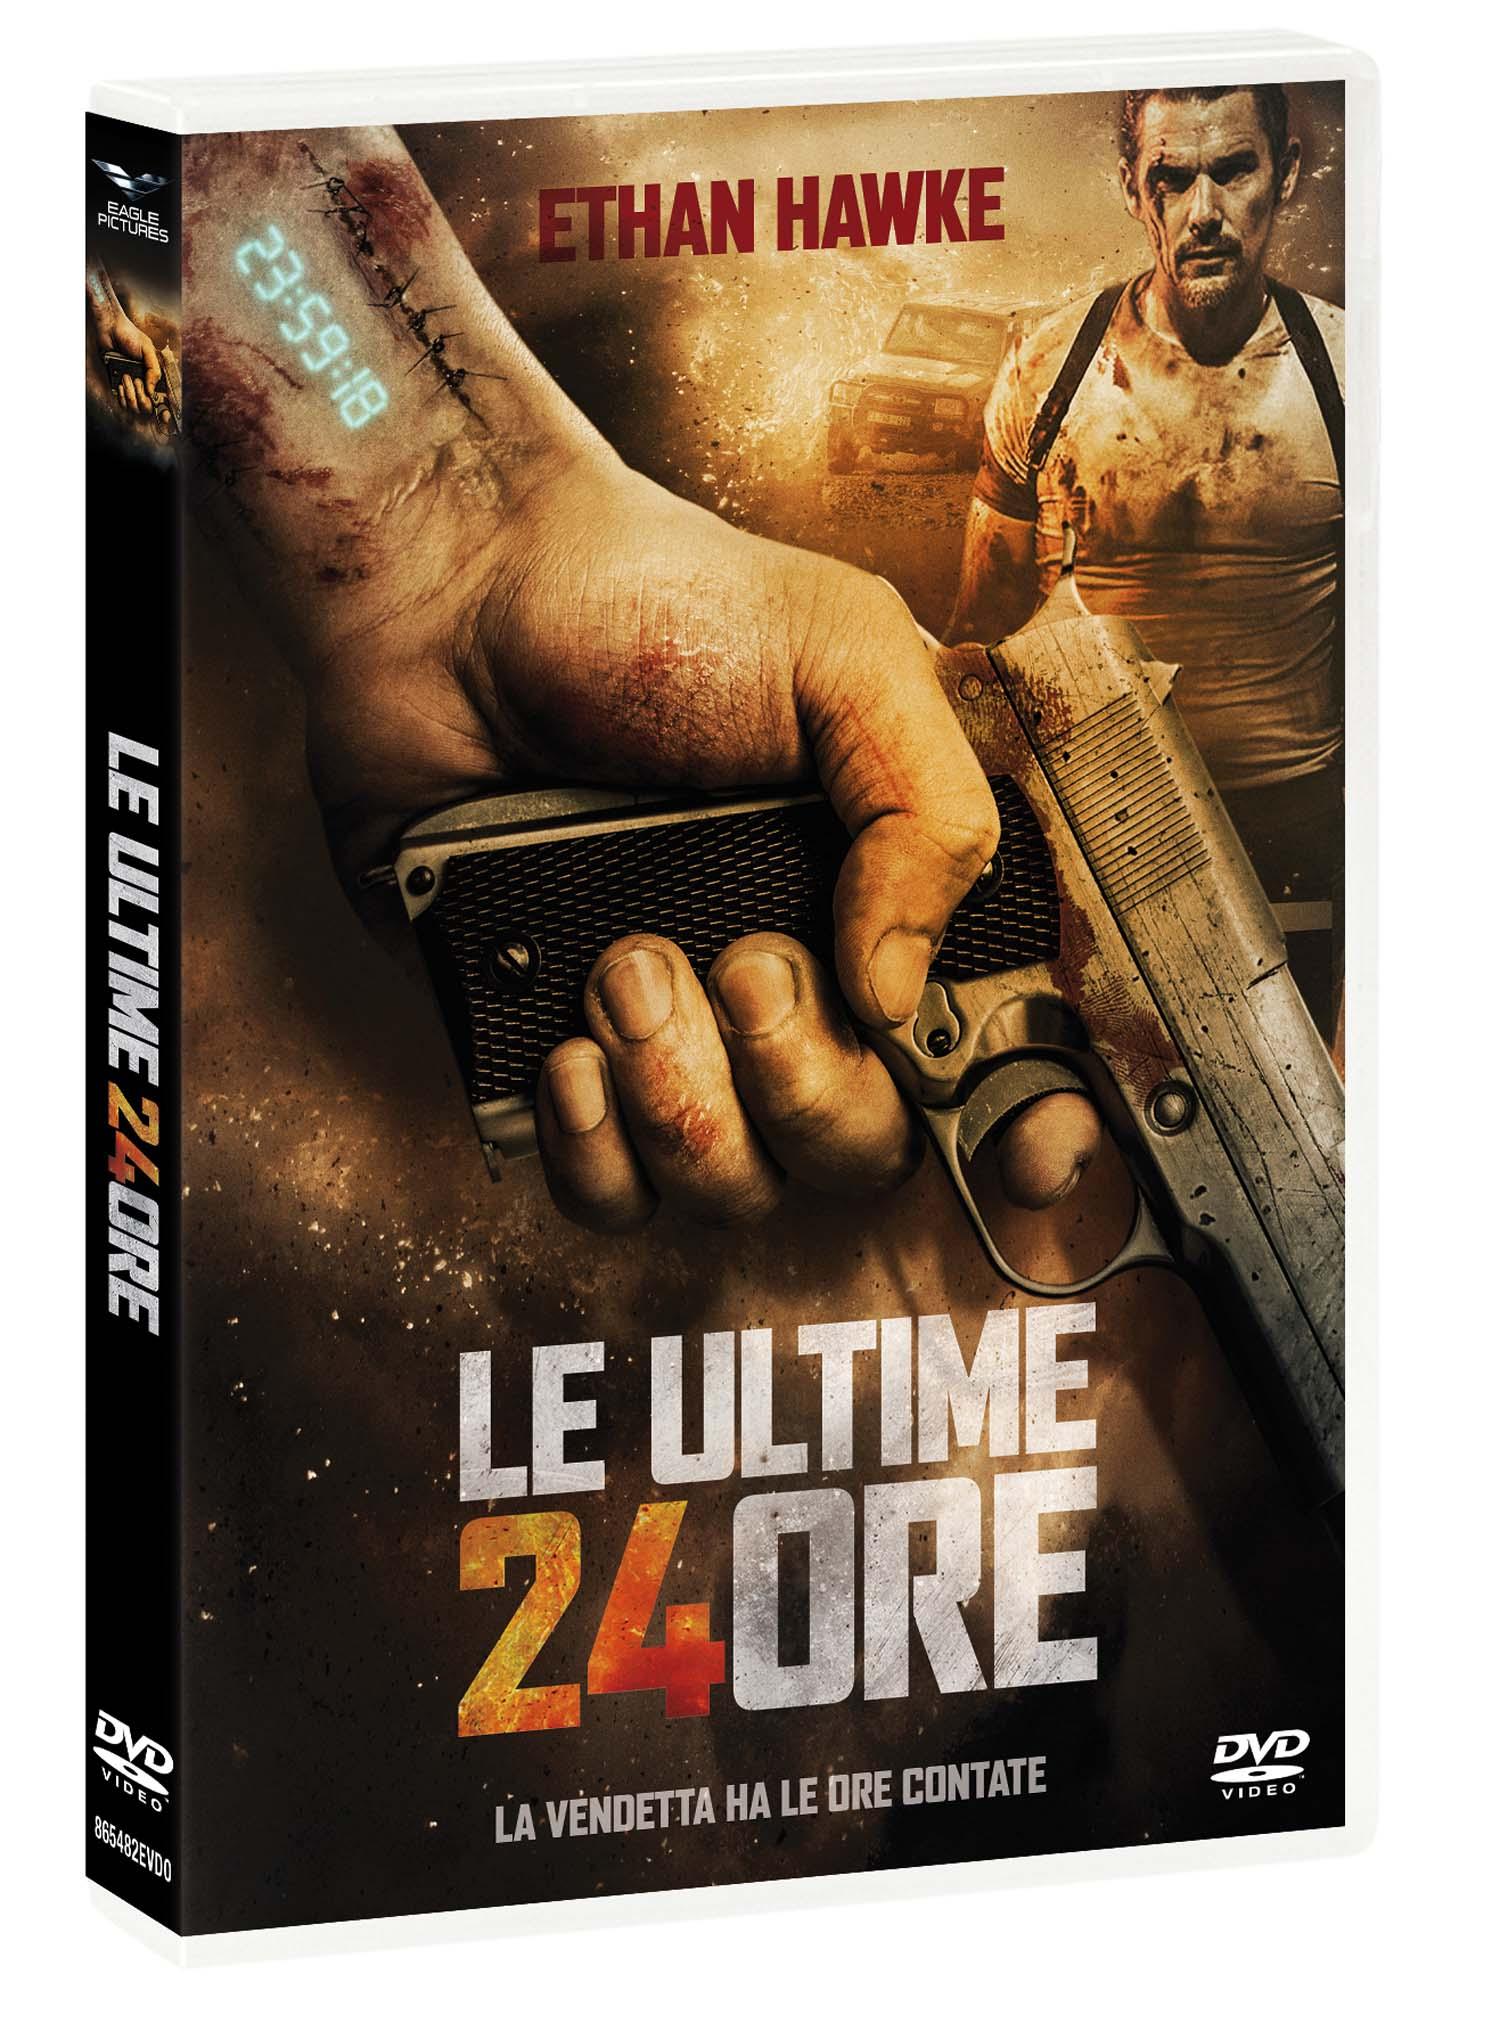 LE ULTIME 24 ORE (DVD)